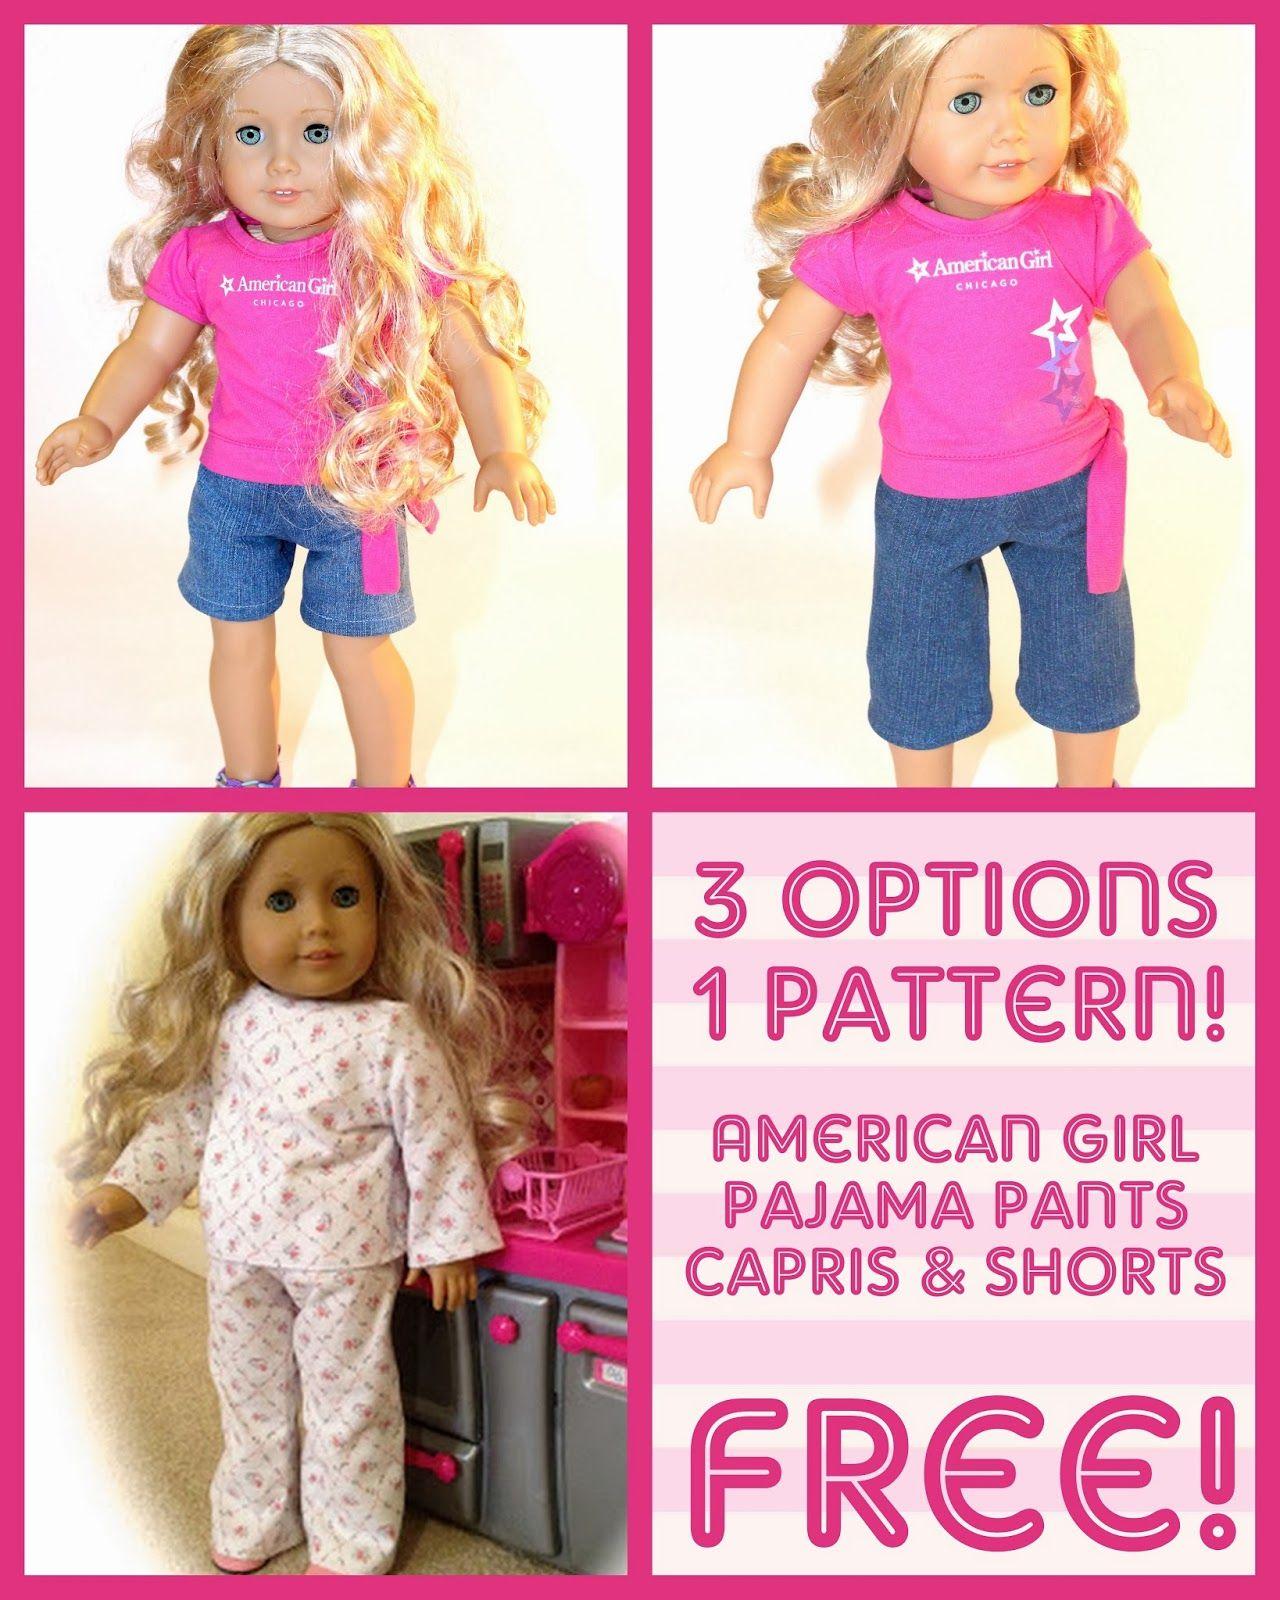 American Girl Jeans/Capris/Shorts Pattern | Schnittmuster, Girls und ...